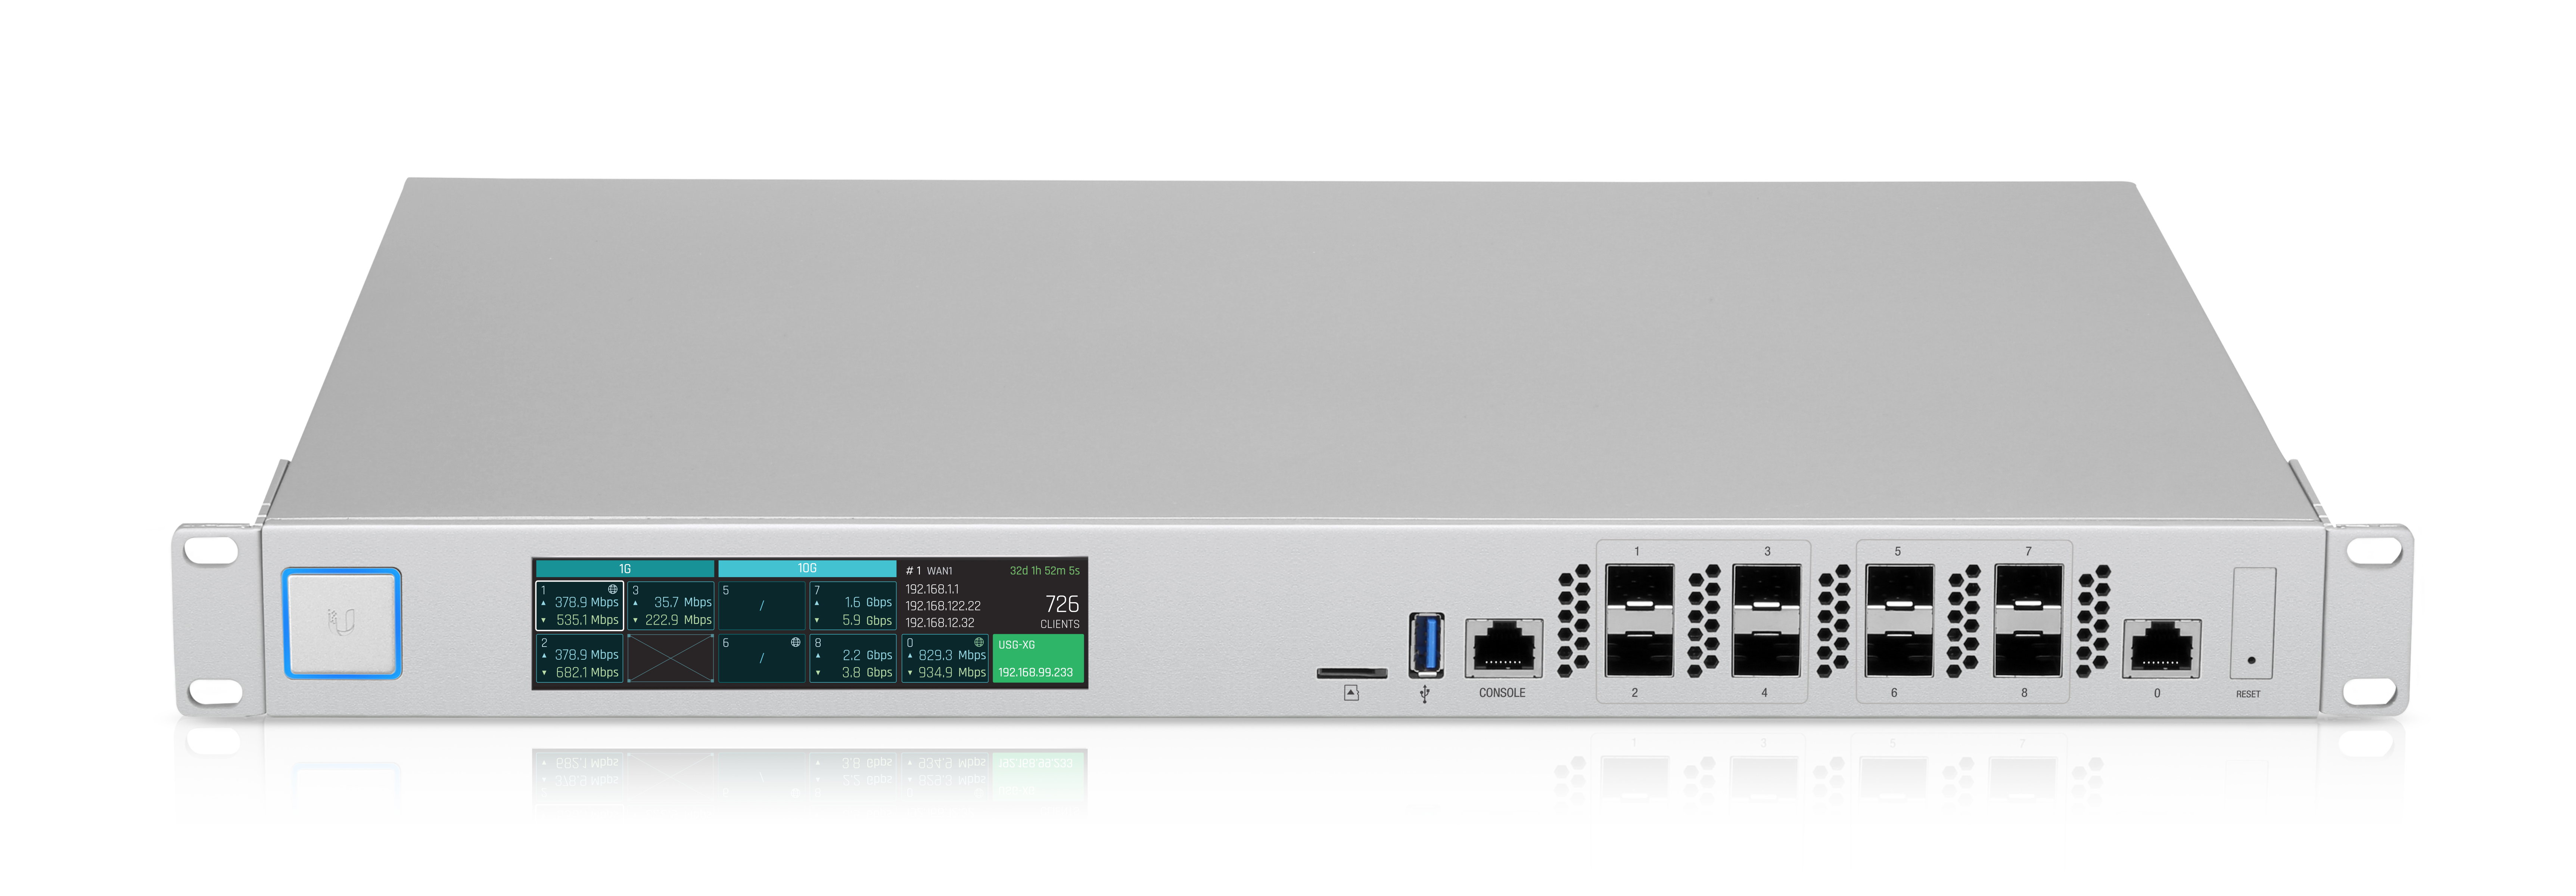 USG-XG-8 UNIFI XG GATEWAY 8x10G SFP+ ,1x Ethernet